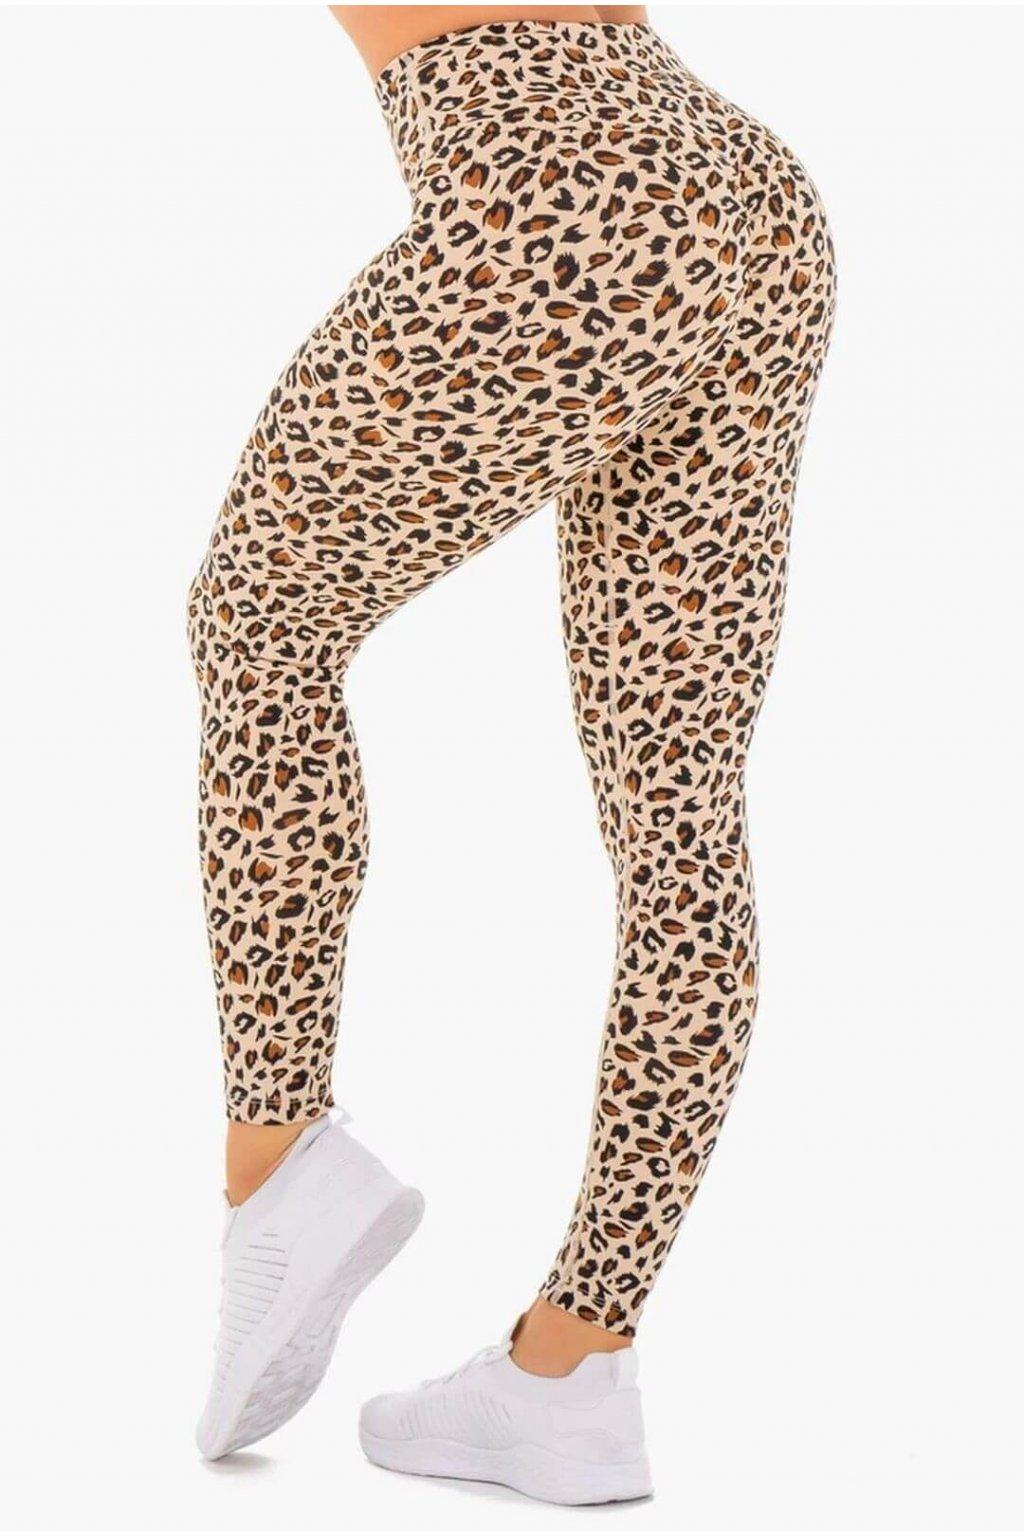 Dámské legíny Heather Leopard Beige